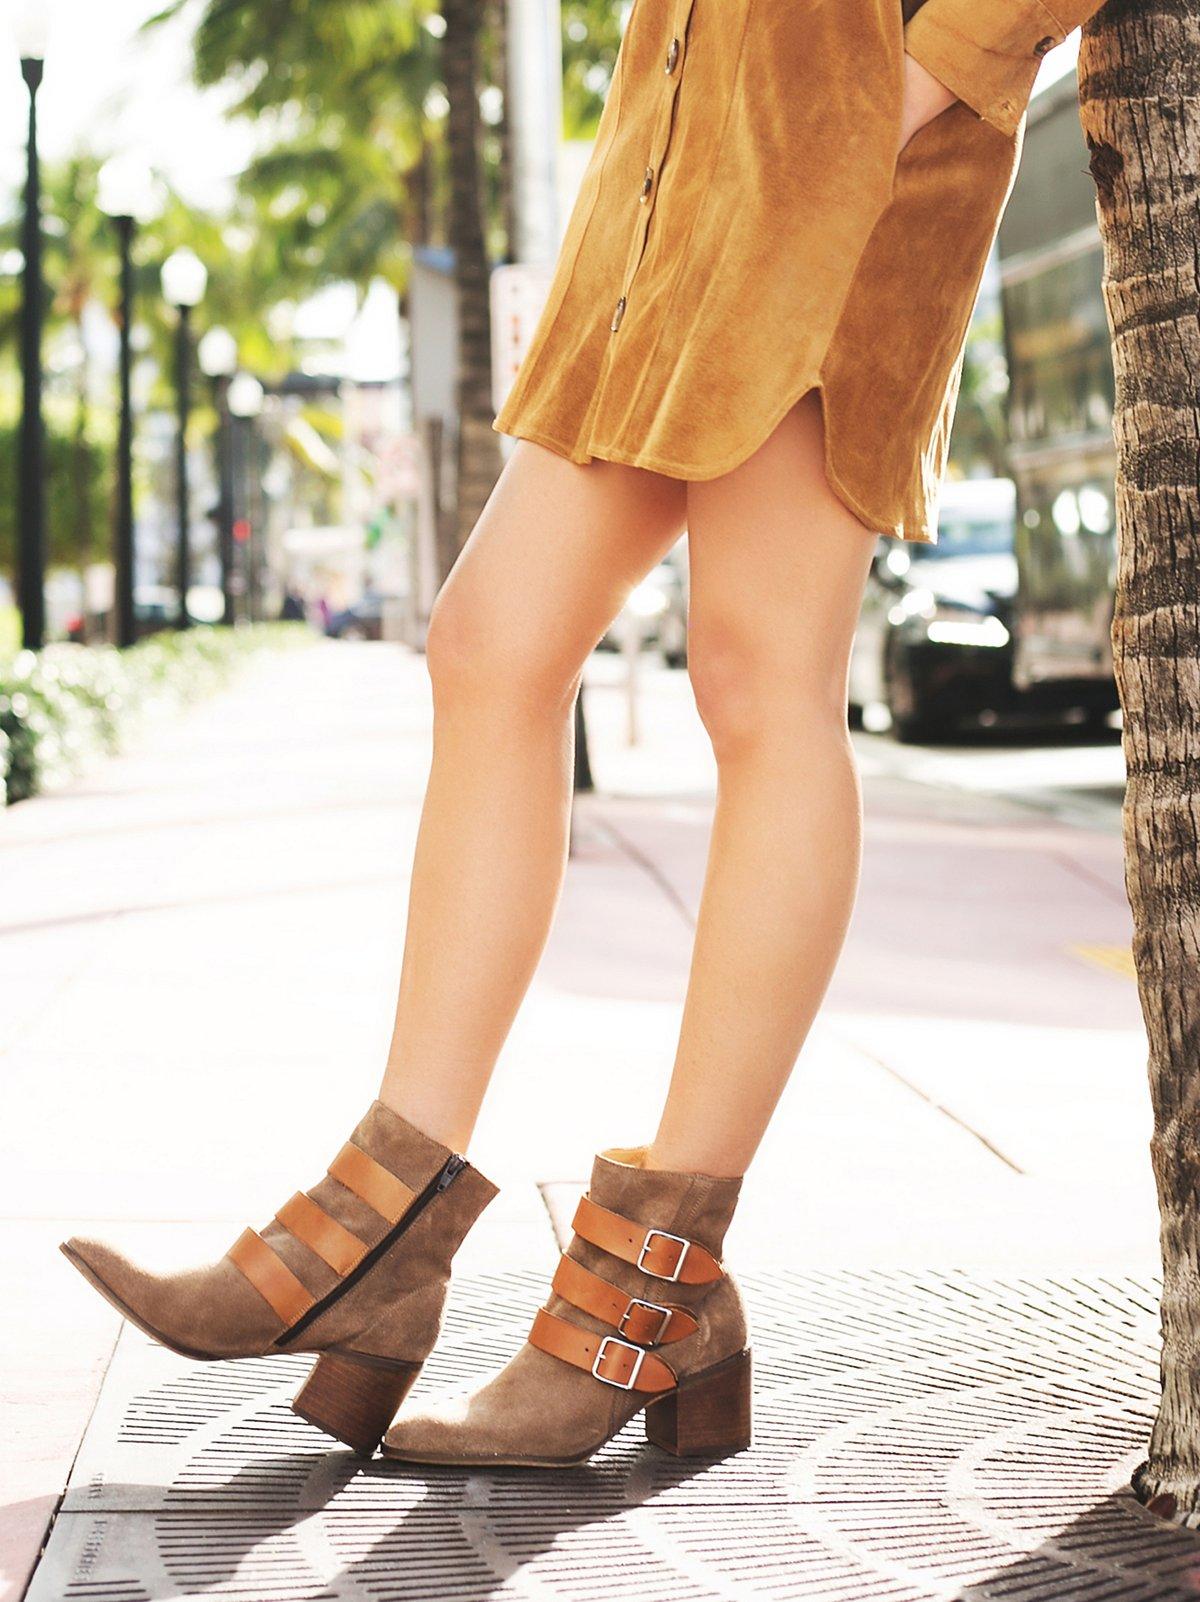 Galaway高跟靴